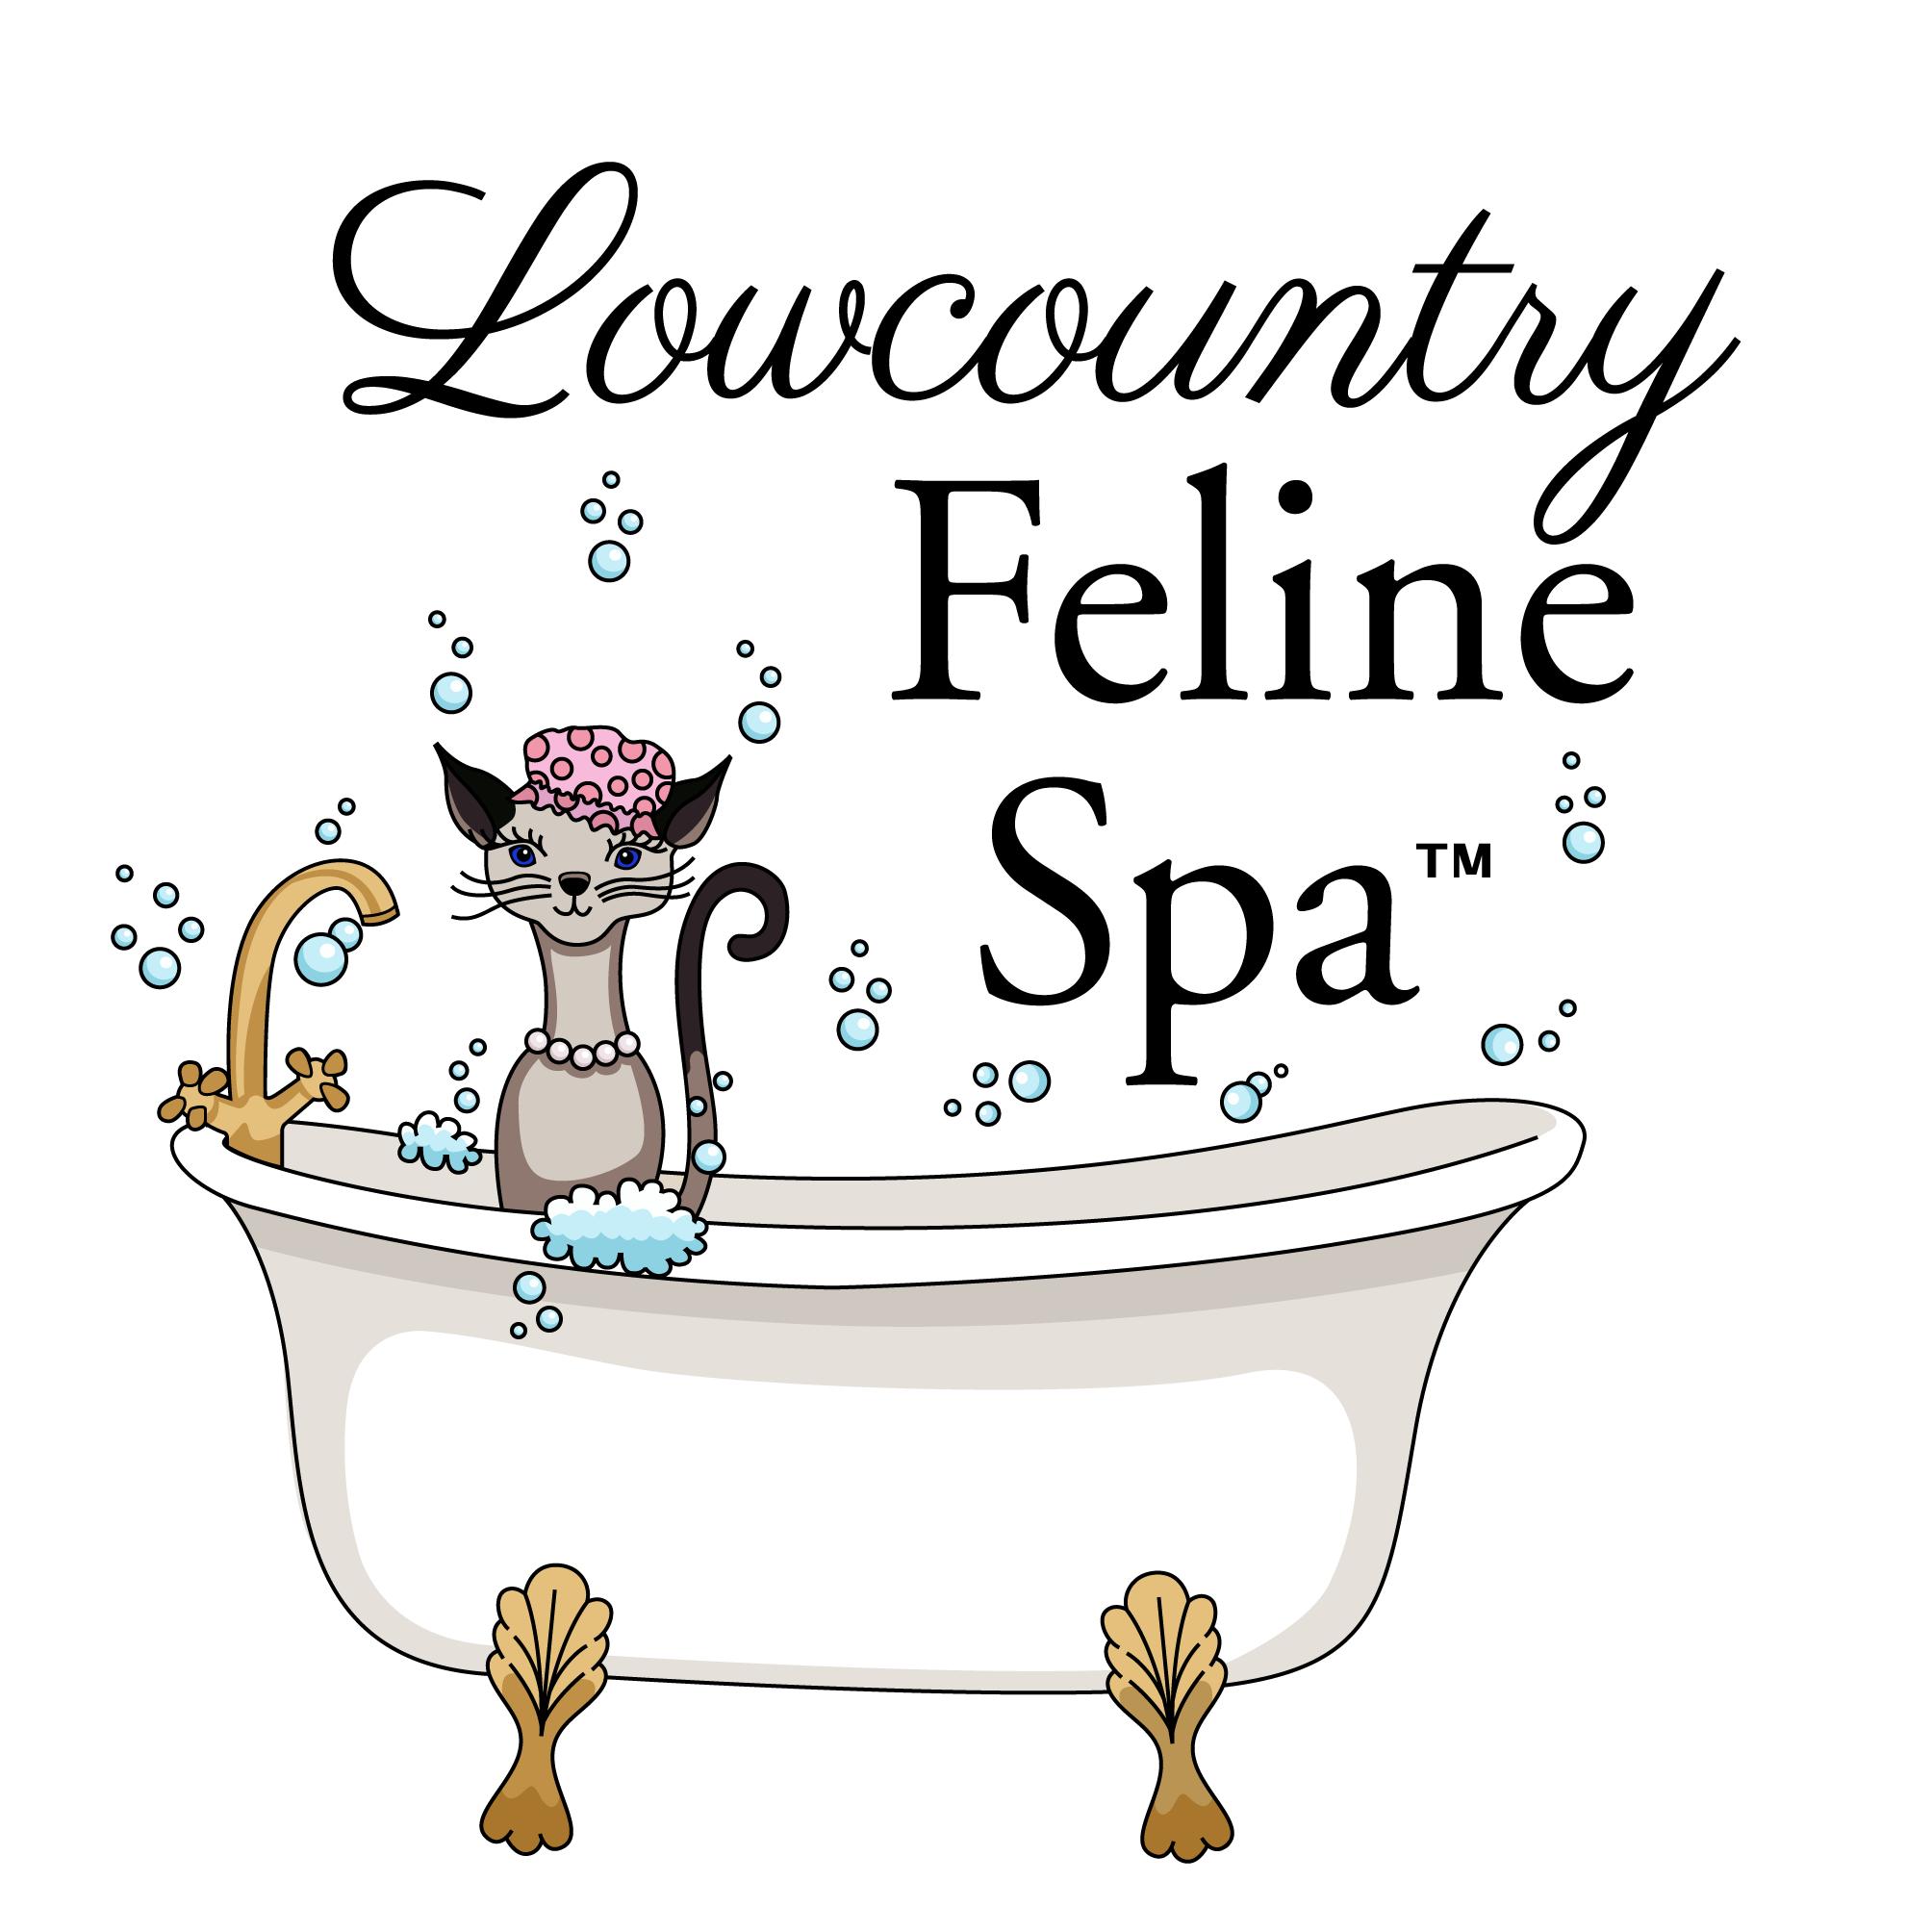 Lowcountry Feline Spa image 10